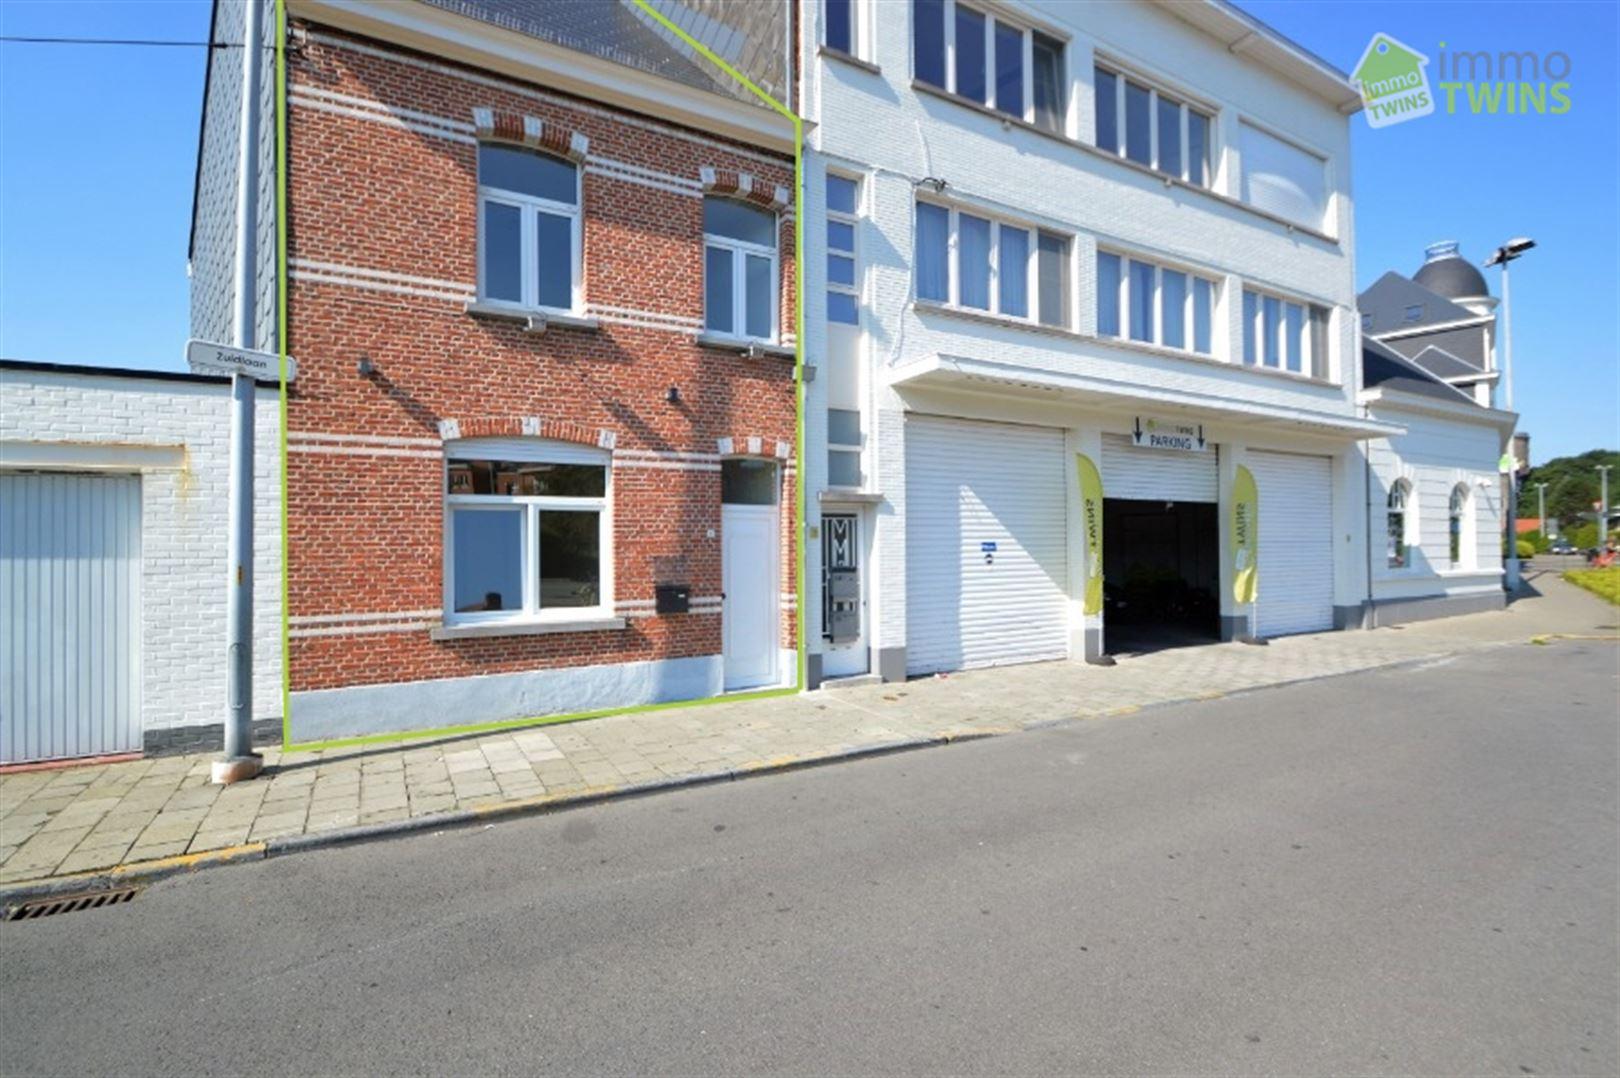 Foto 1 : Woning te 9200 Dendermonde (België) - Prijs € 650